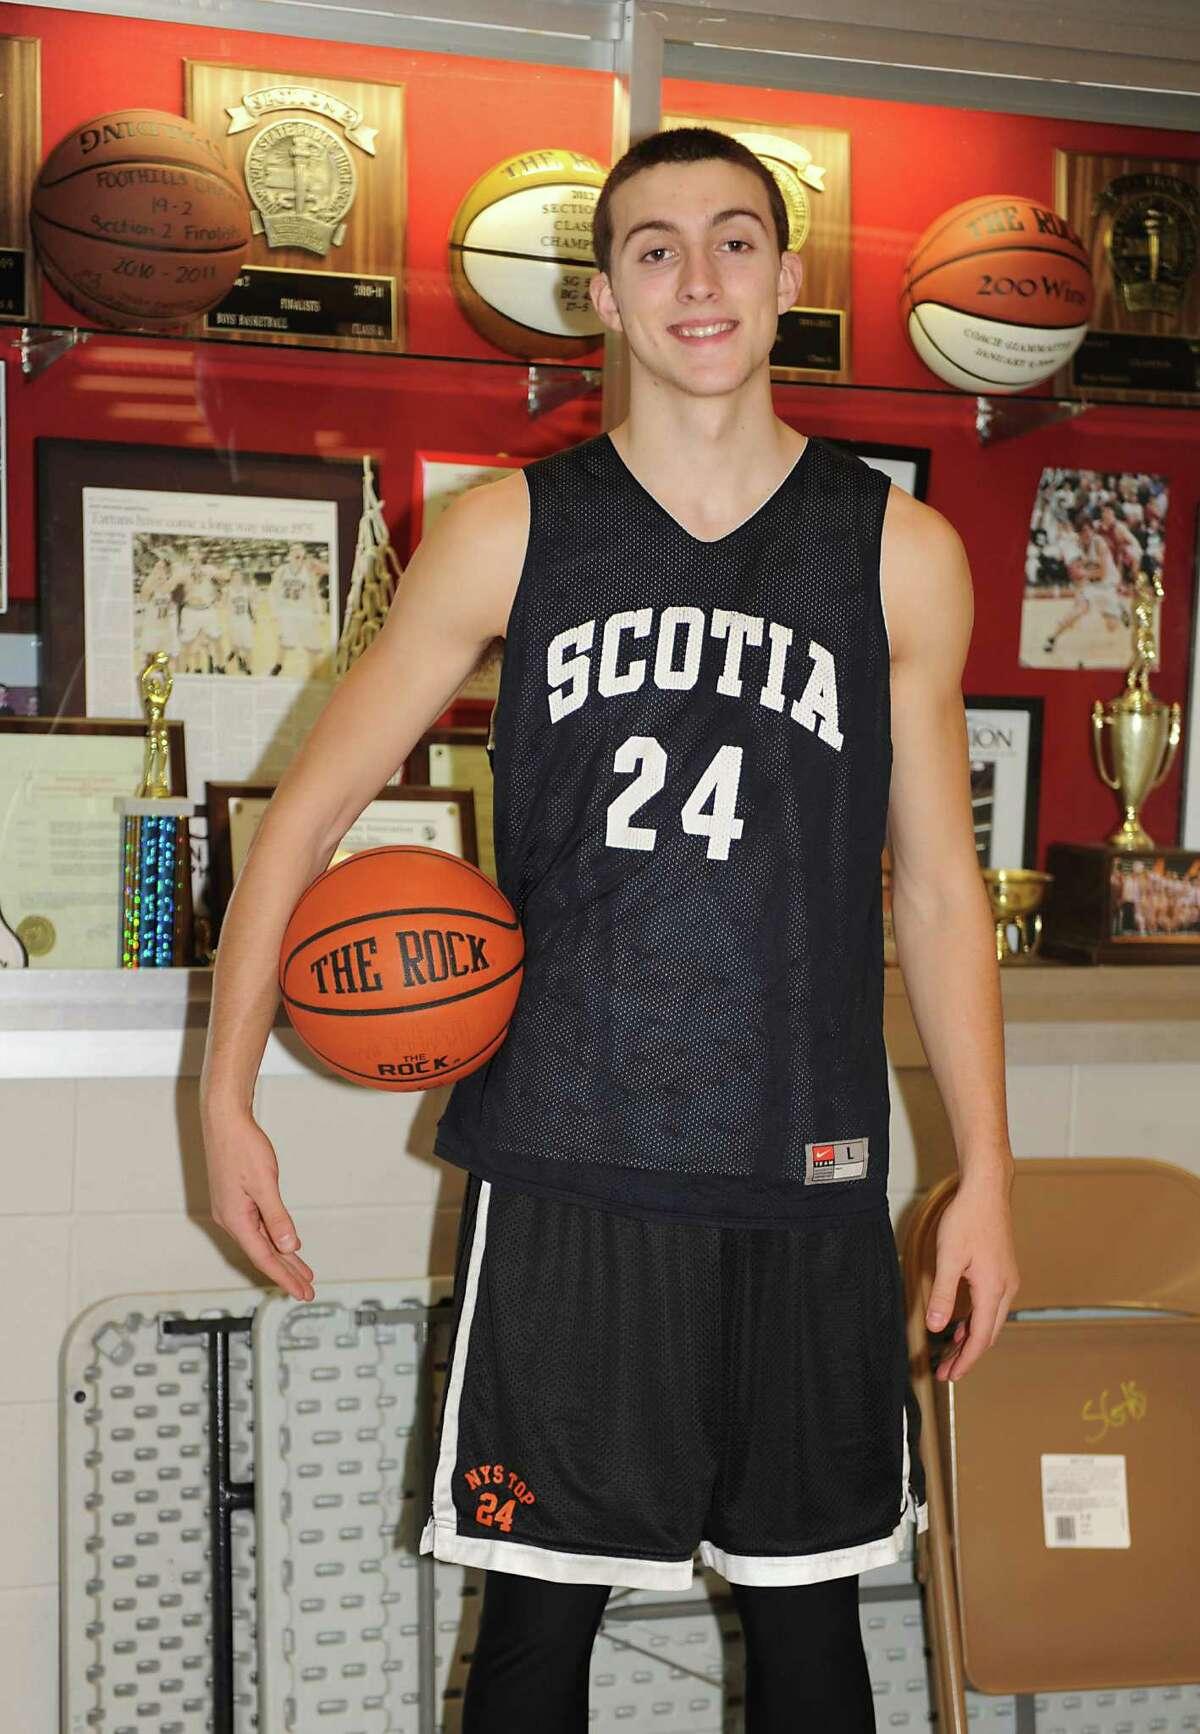 Co-sportsman of the year, Scotia basketball player Joe Cremo before practice on Tuesday, Dec. 23, 2014 in Scotia, N.Y. (Lori Van Buren / Times Union)